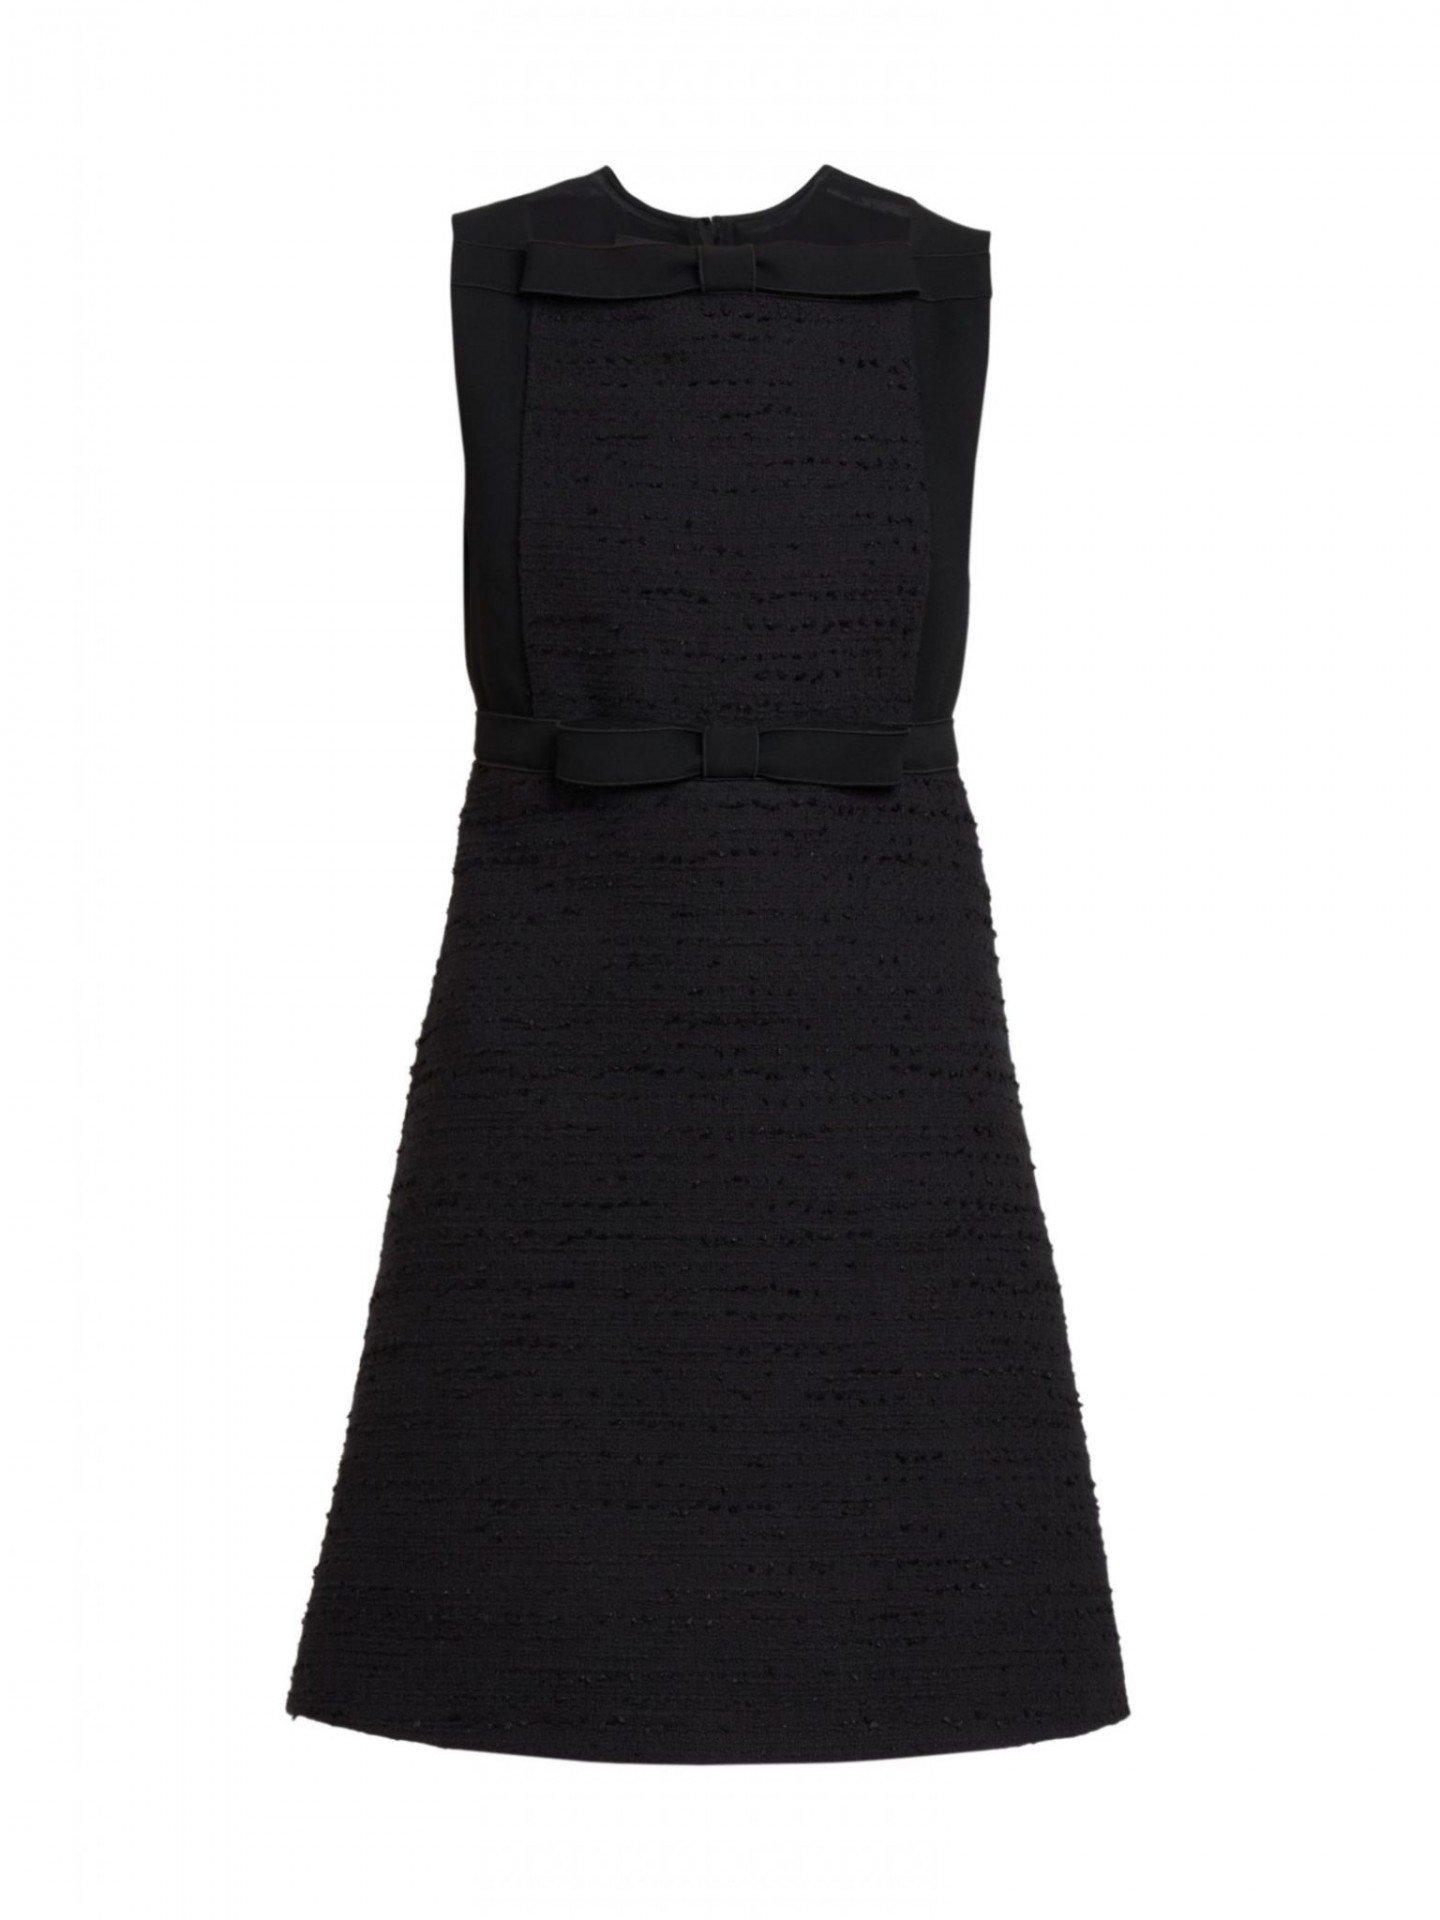 GIAMBATTISTA VALLI Bow Front Sleeveless Tweed Dress